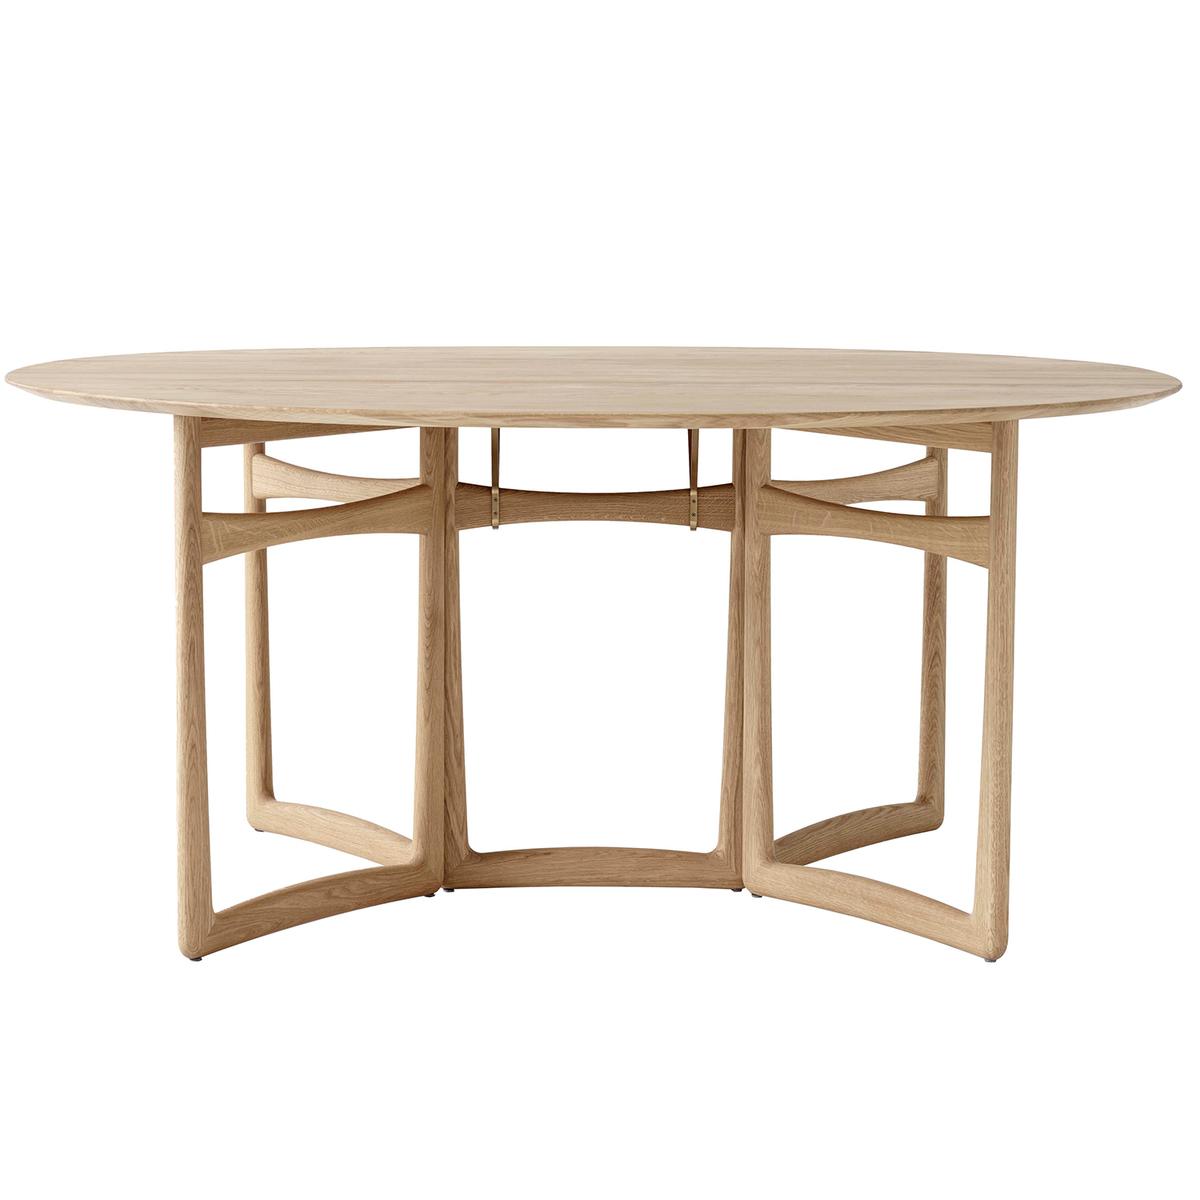 Landscape Lighting Around Pool, Tradition Drop Leaf Hm6 Dining Table White Oiled Oak Finnish Design Shop